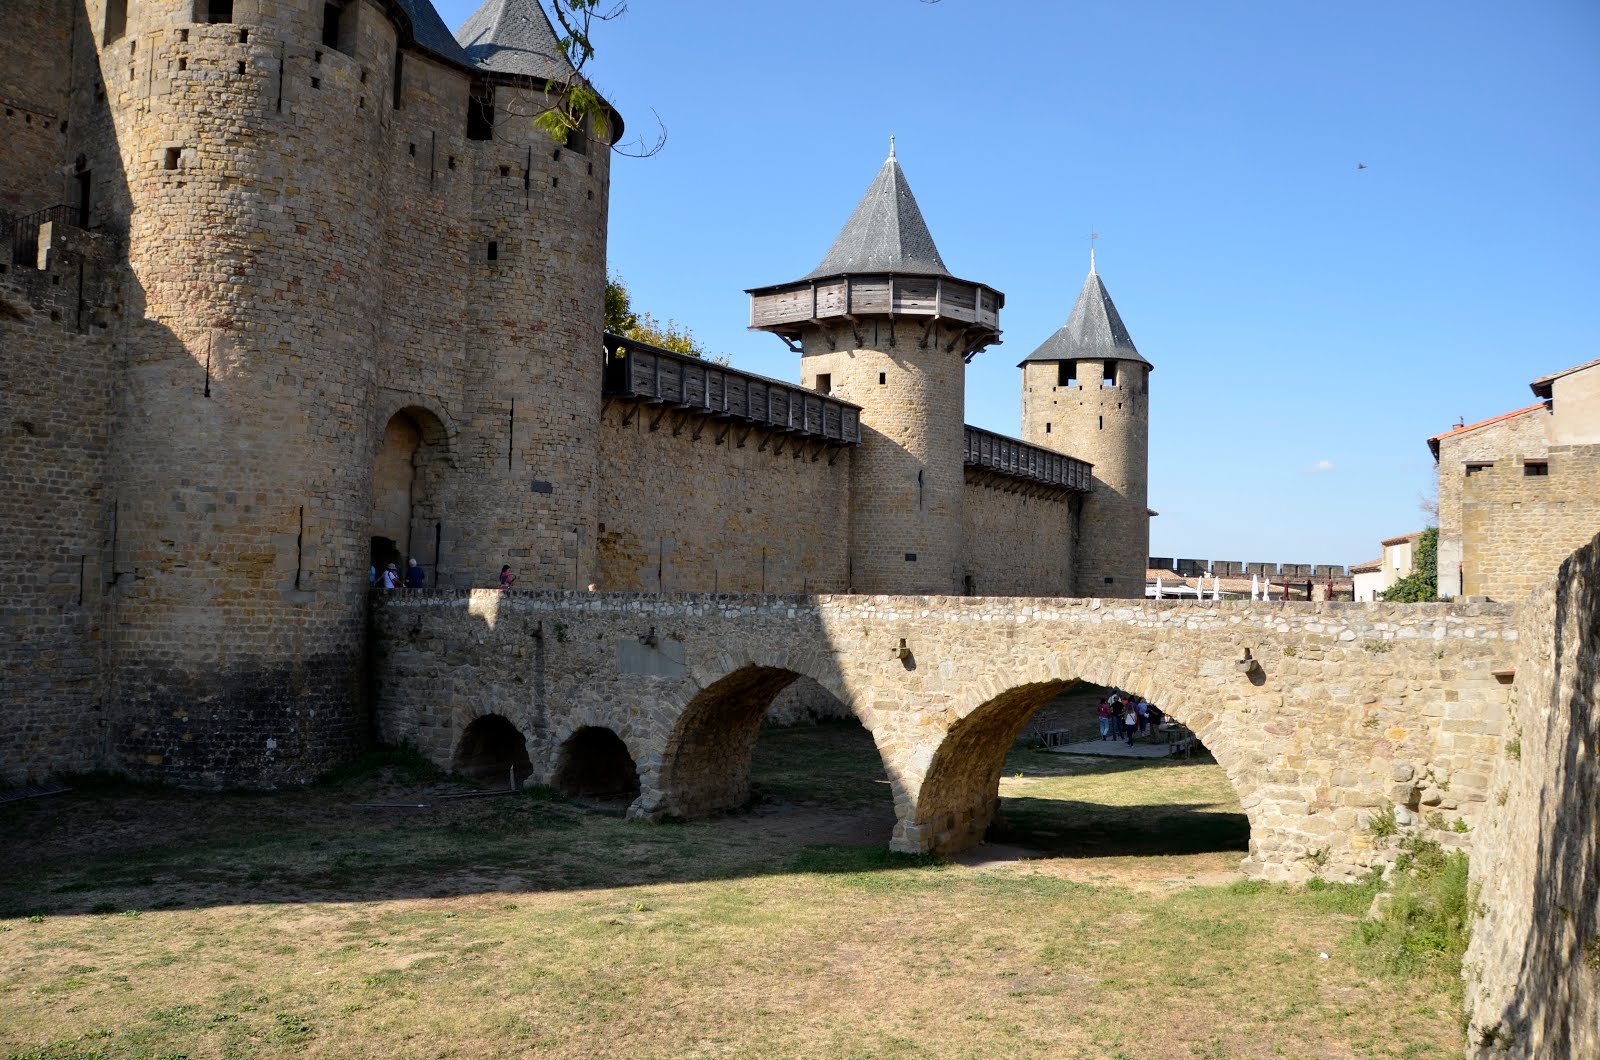 Dating Man Carcassonne.